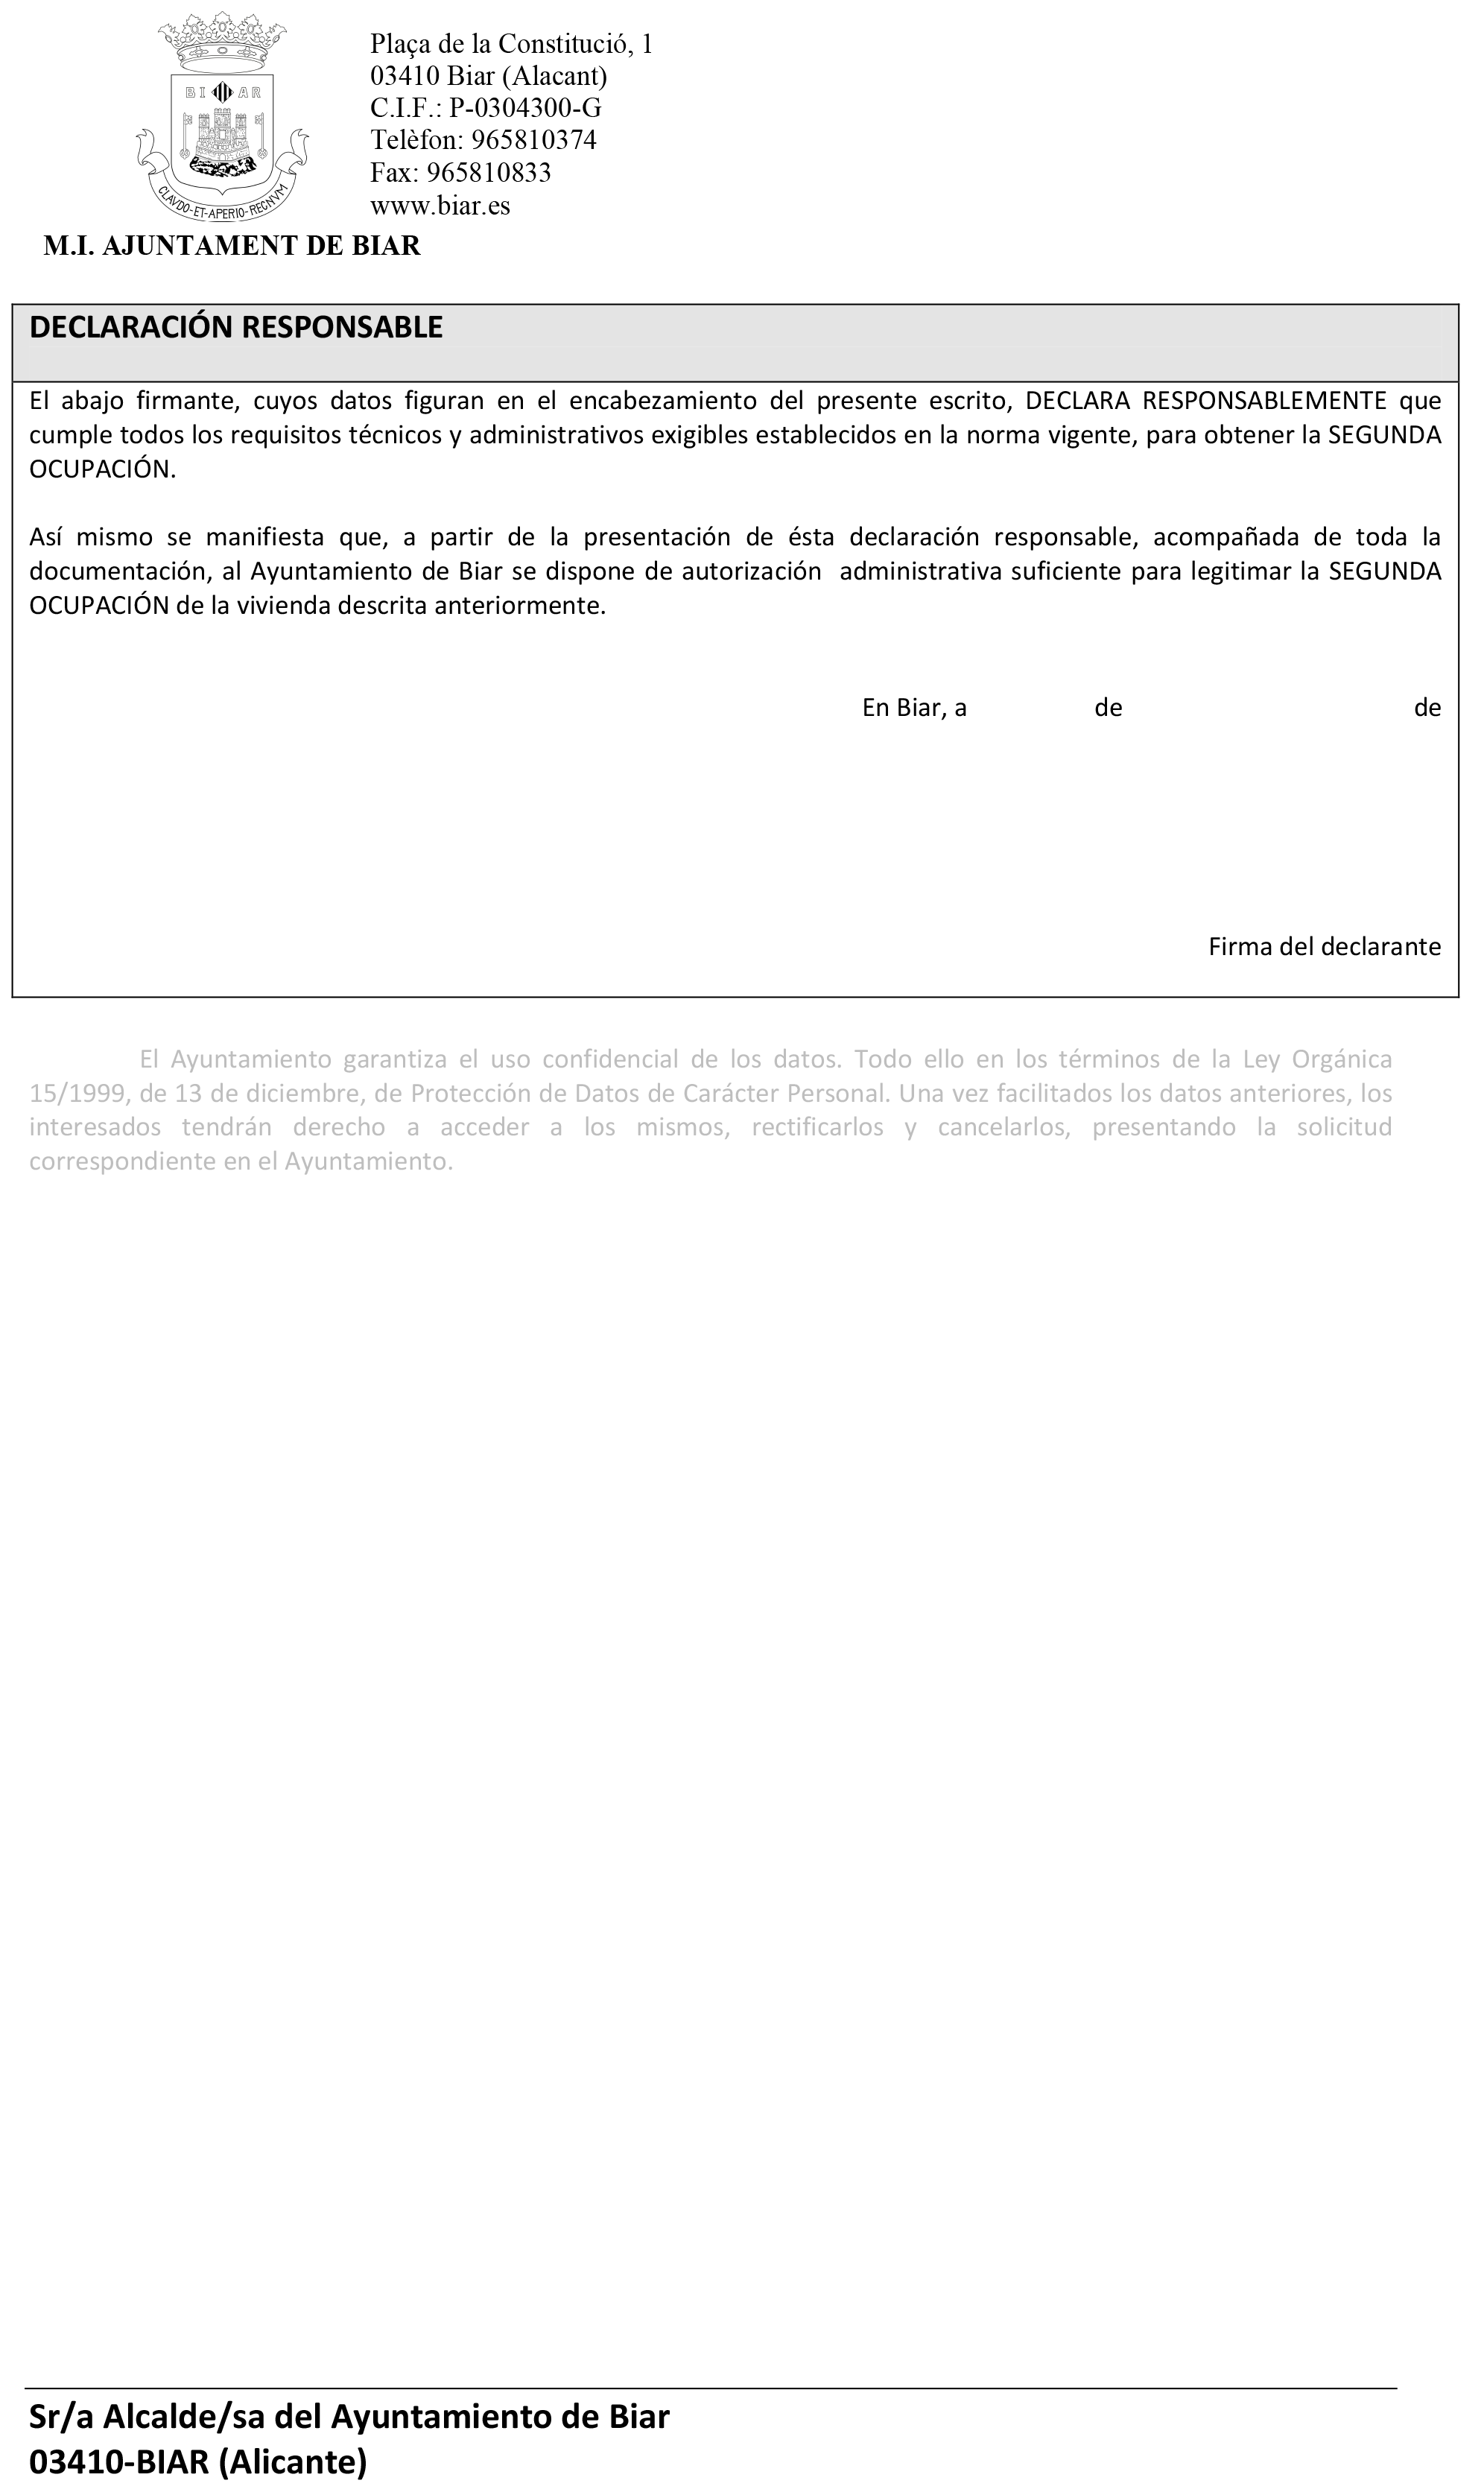 Declaracion Responsable de Segunda Ocupacion - Biar-2